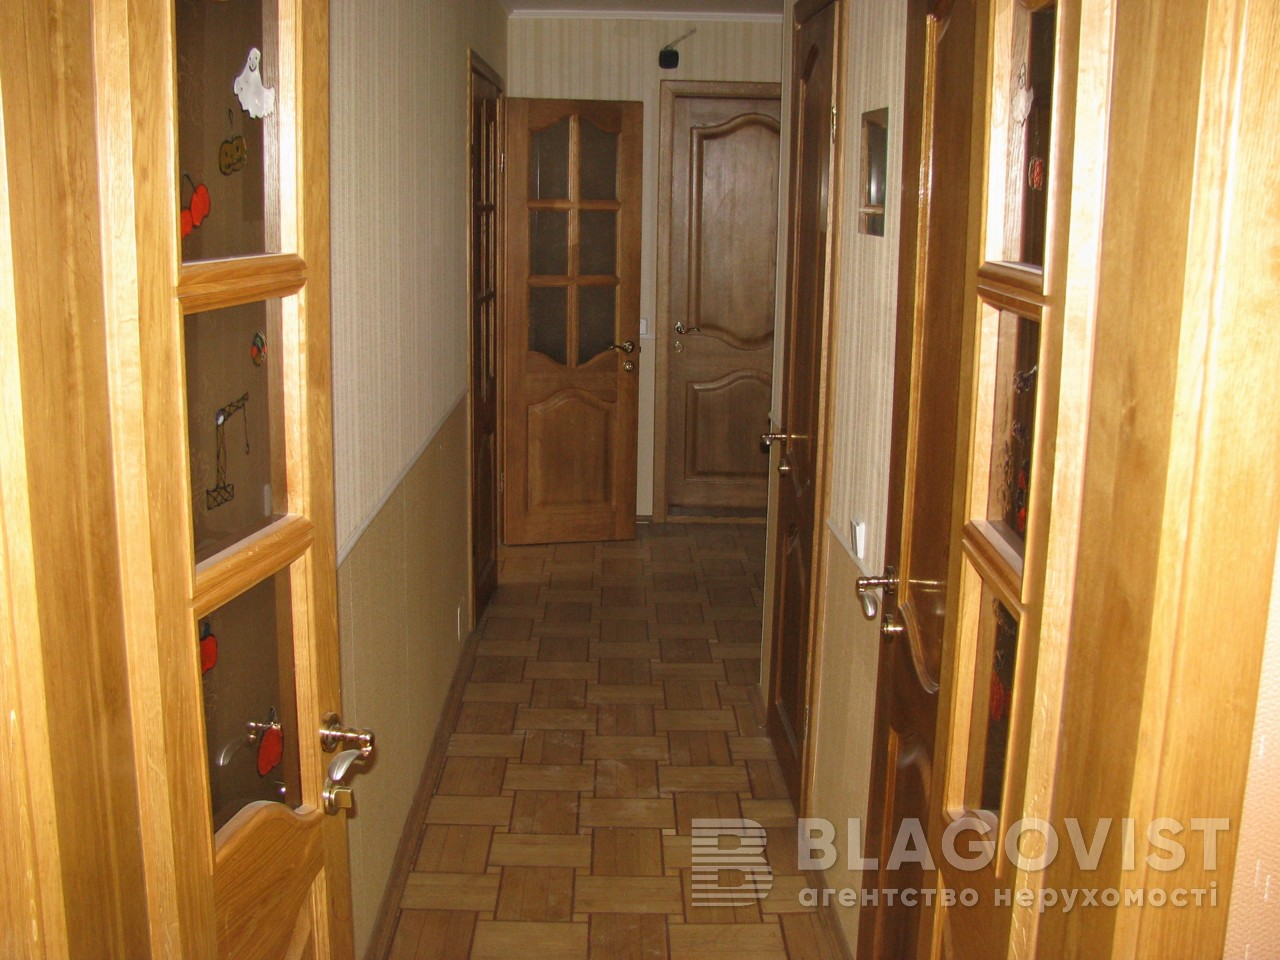 Квартира H-35926, Богатырская, 6/1, Киев - Фото 17